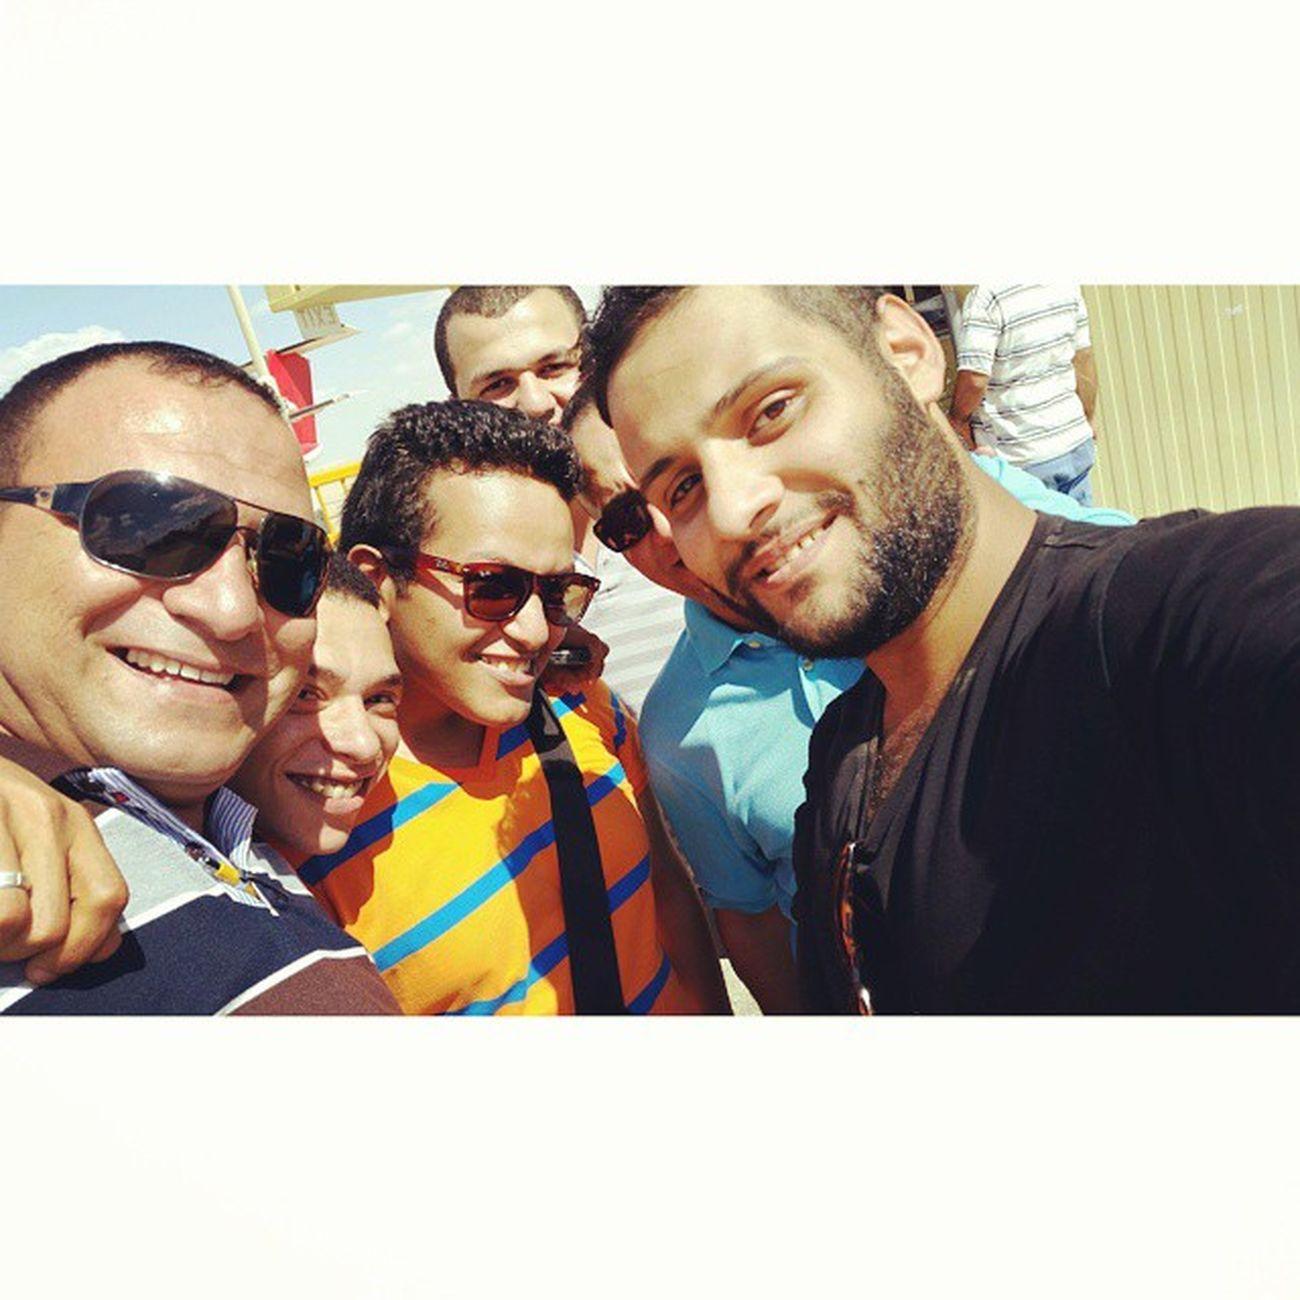 Sa7ara Training Petroleumengineers Selfie fun